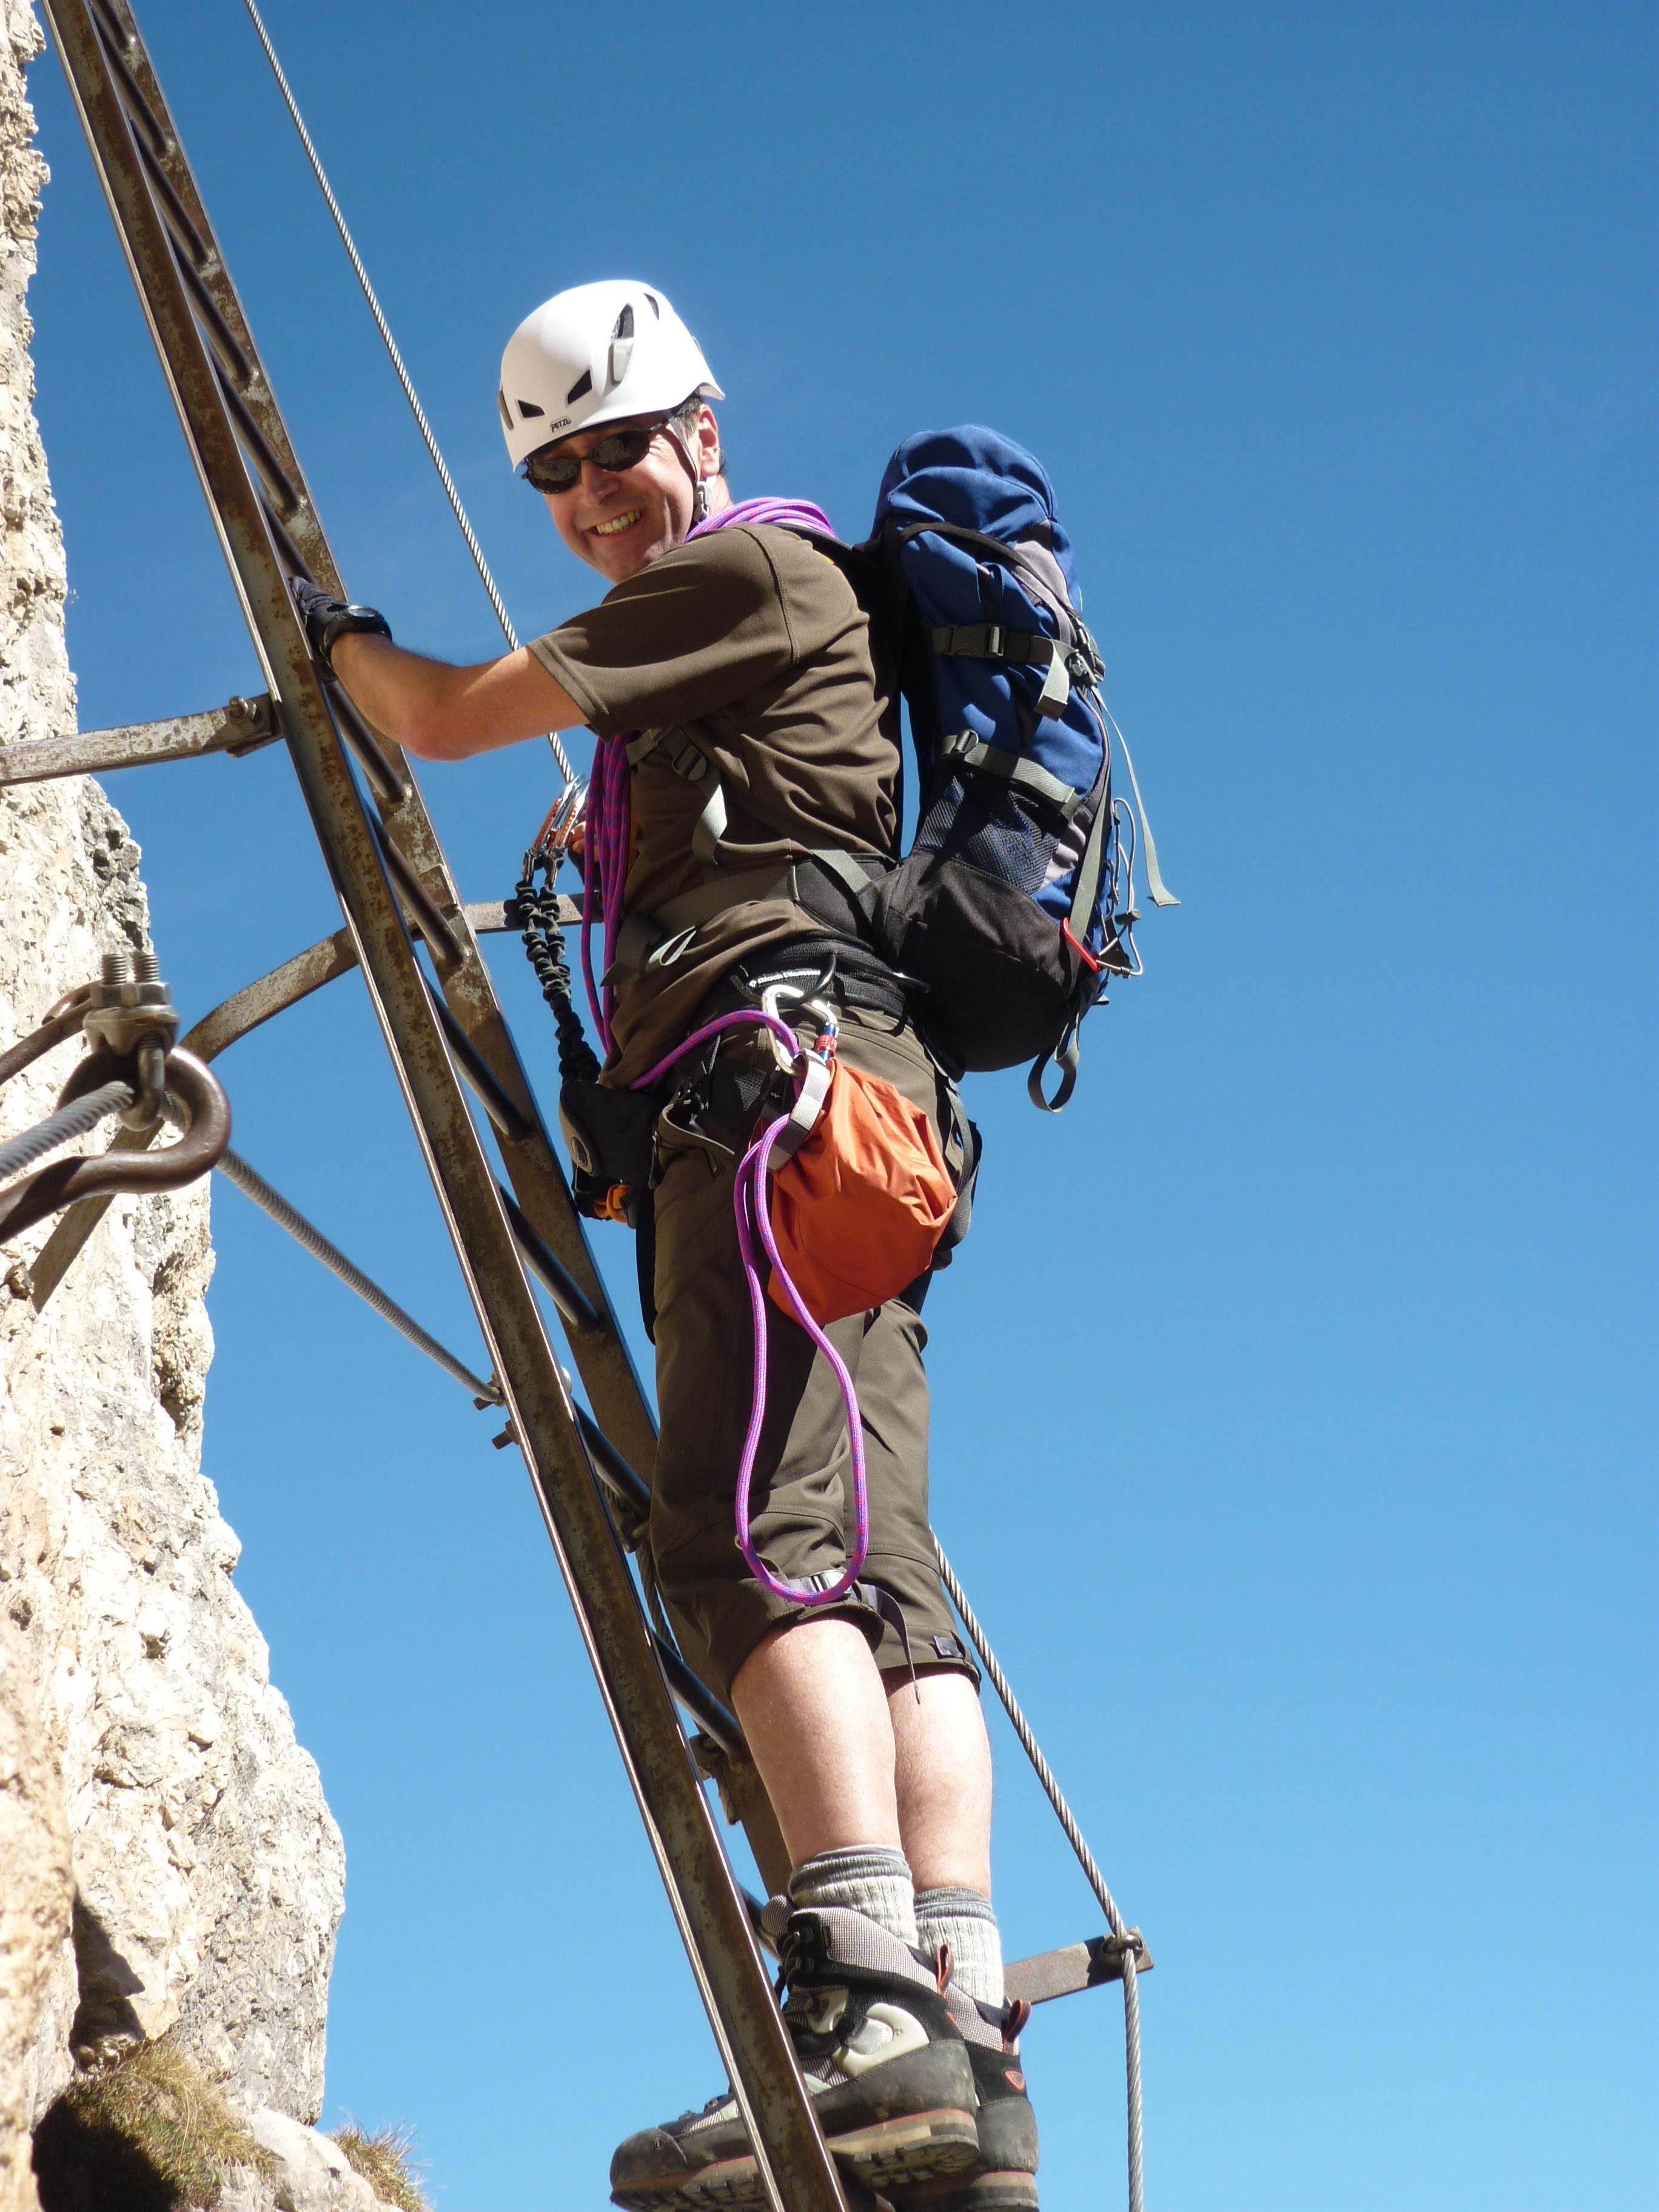 More On Equipment For Dolomites Helmets Plus Free Guide